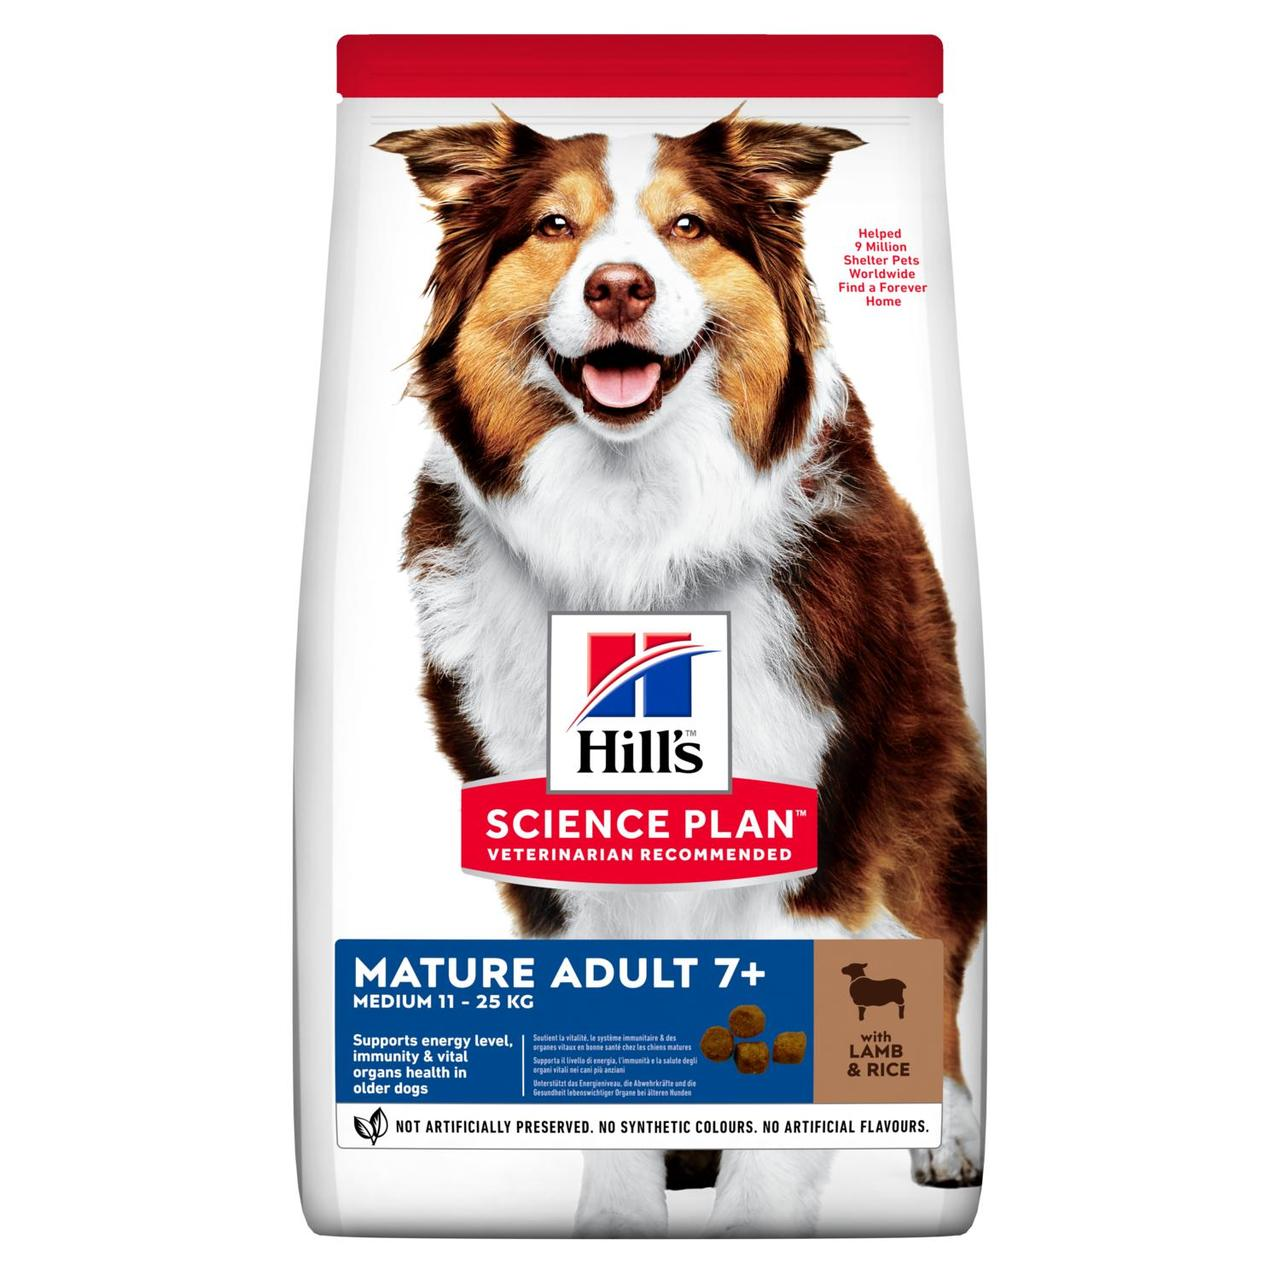 Hills (Хиллс) Mature Adult 7+ Medium Breed Lamb & Rice сухой корм для стареющих собак с ягненком, 14 кг